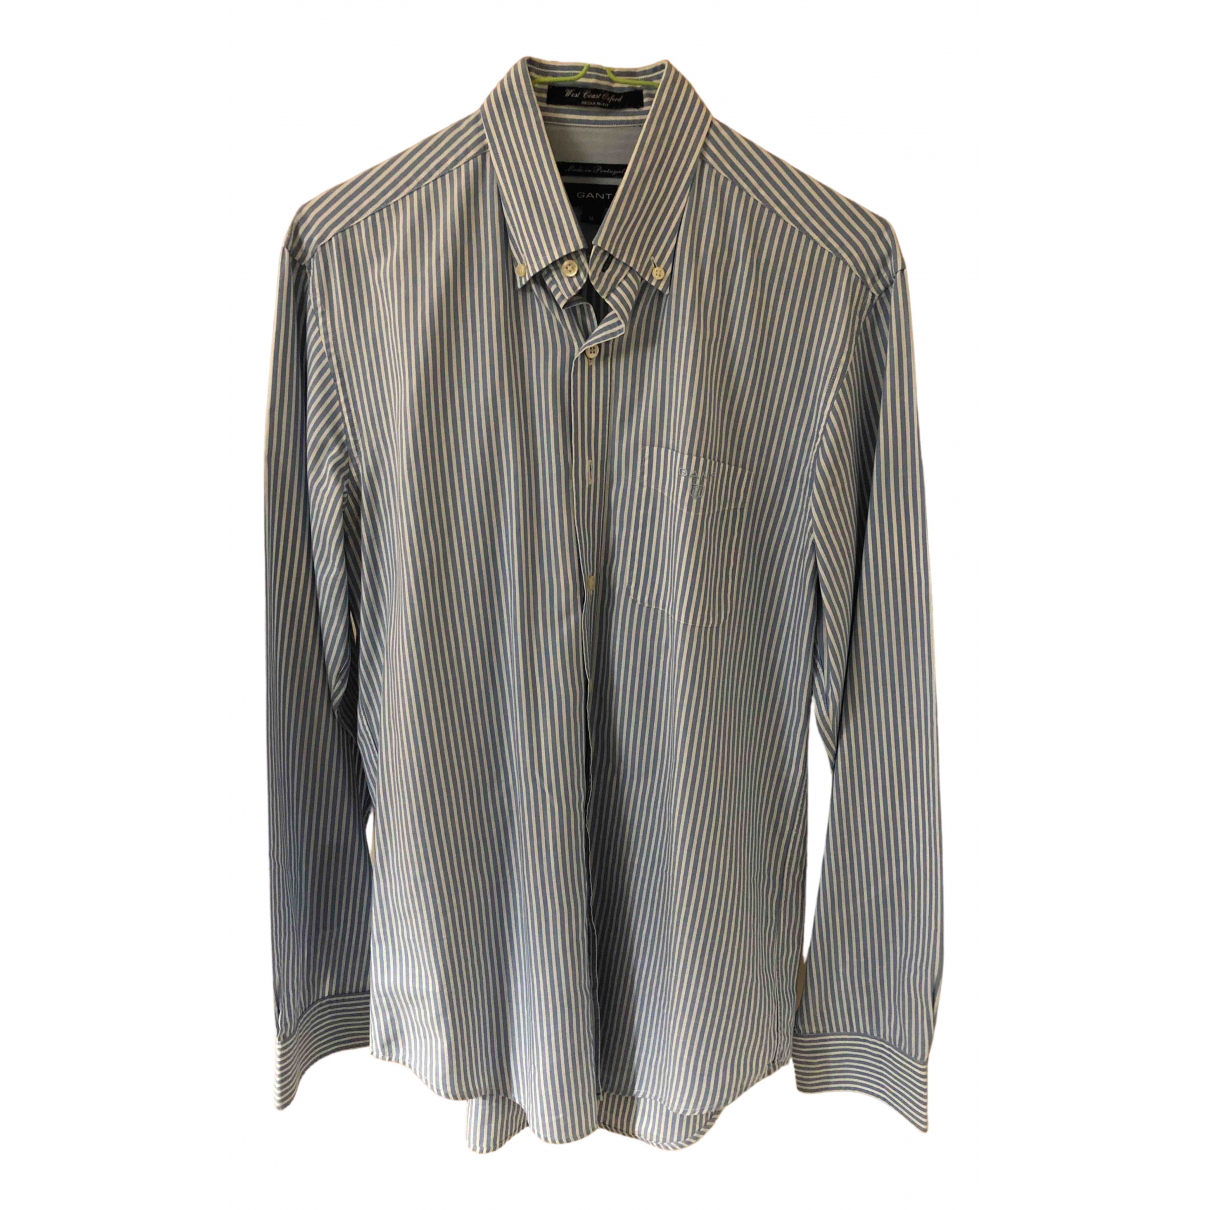 Gant \N Blue Cotton Shirts for Men M International